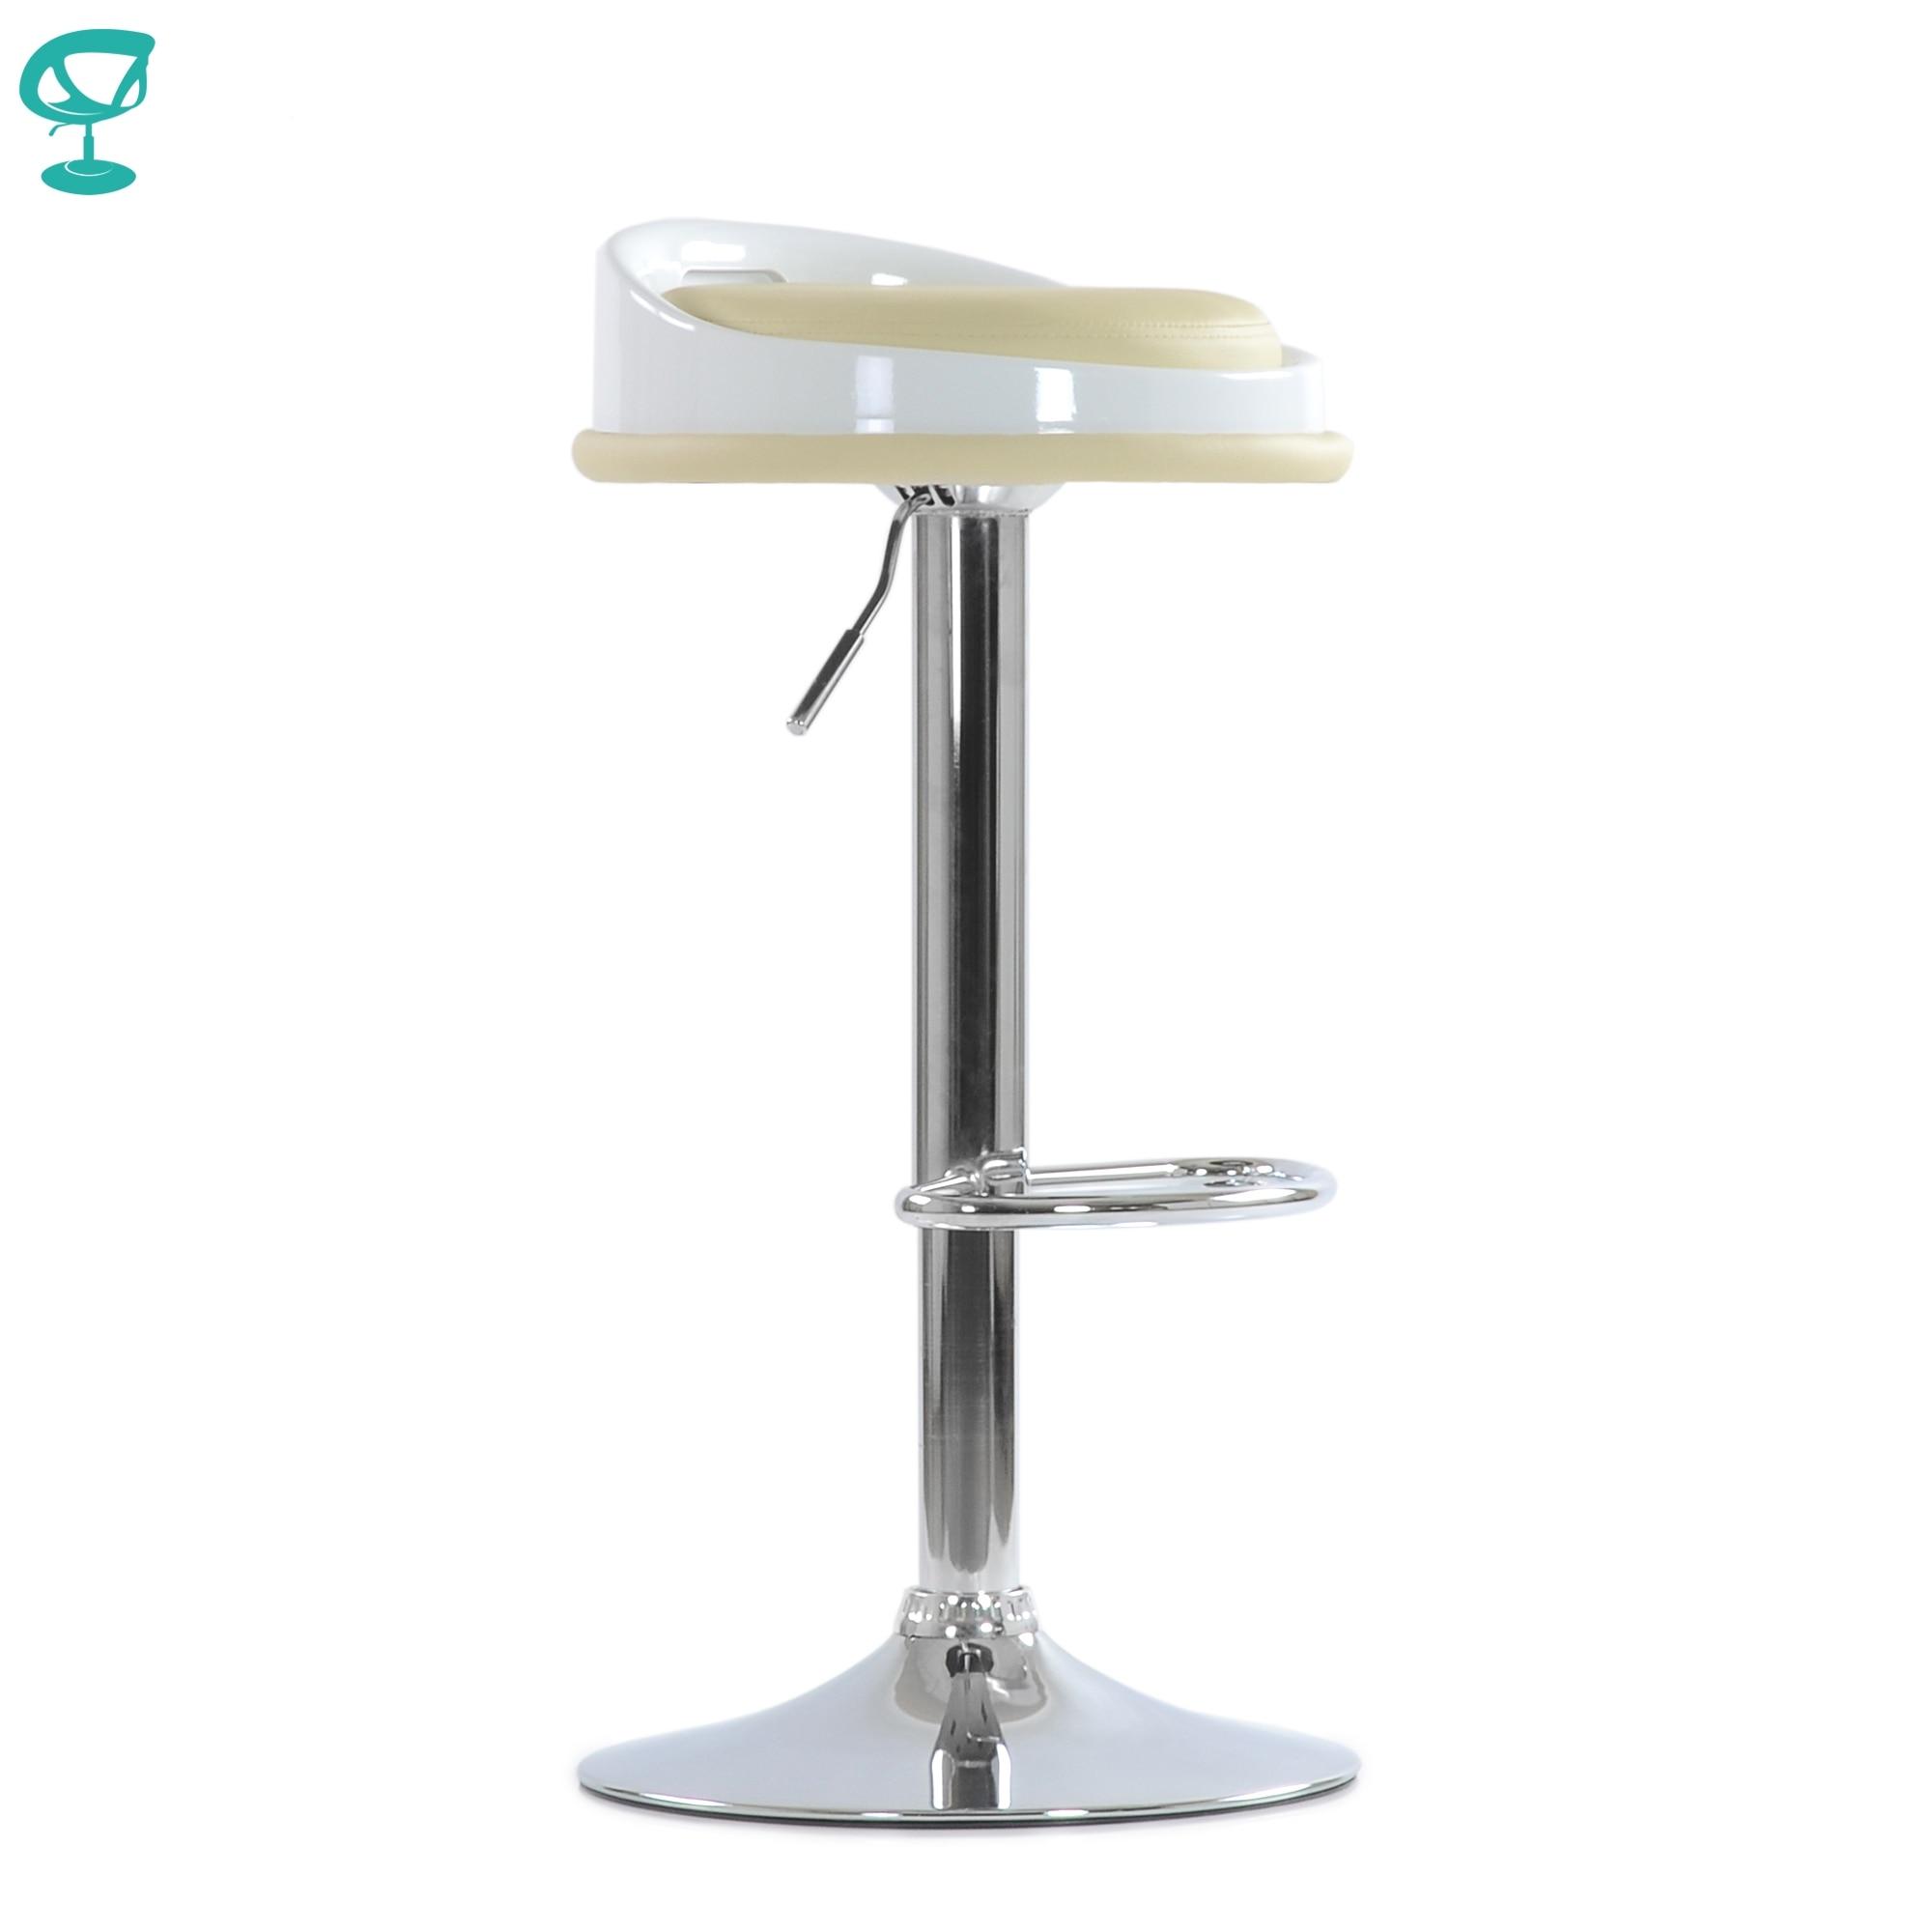 95727 Barneo N-49 Beige Eco-leather Kitchen Bar Stool High Chair Soft Seat Gas-lift Chair барной Rack броу Bar